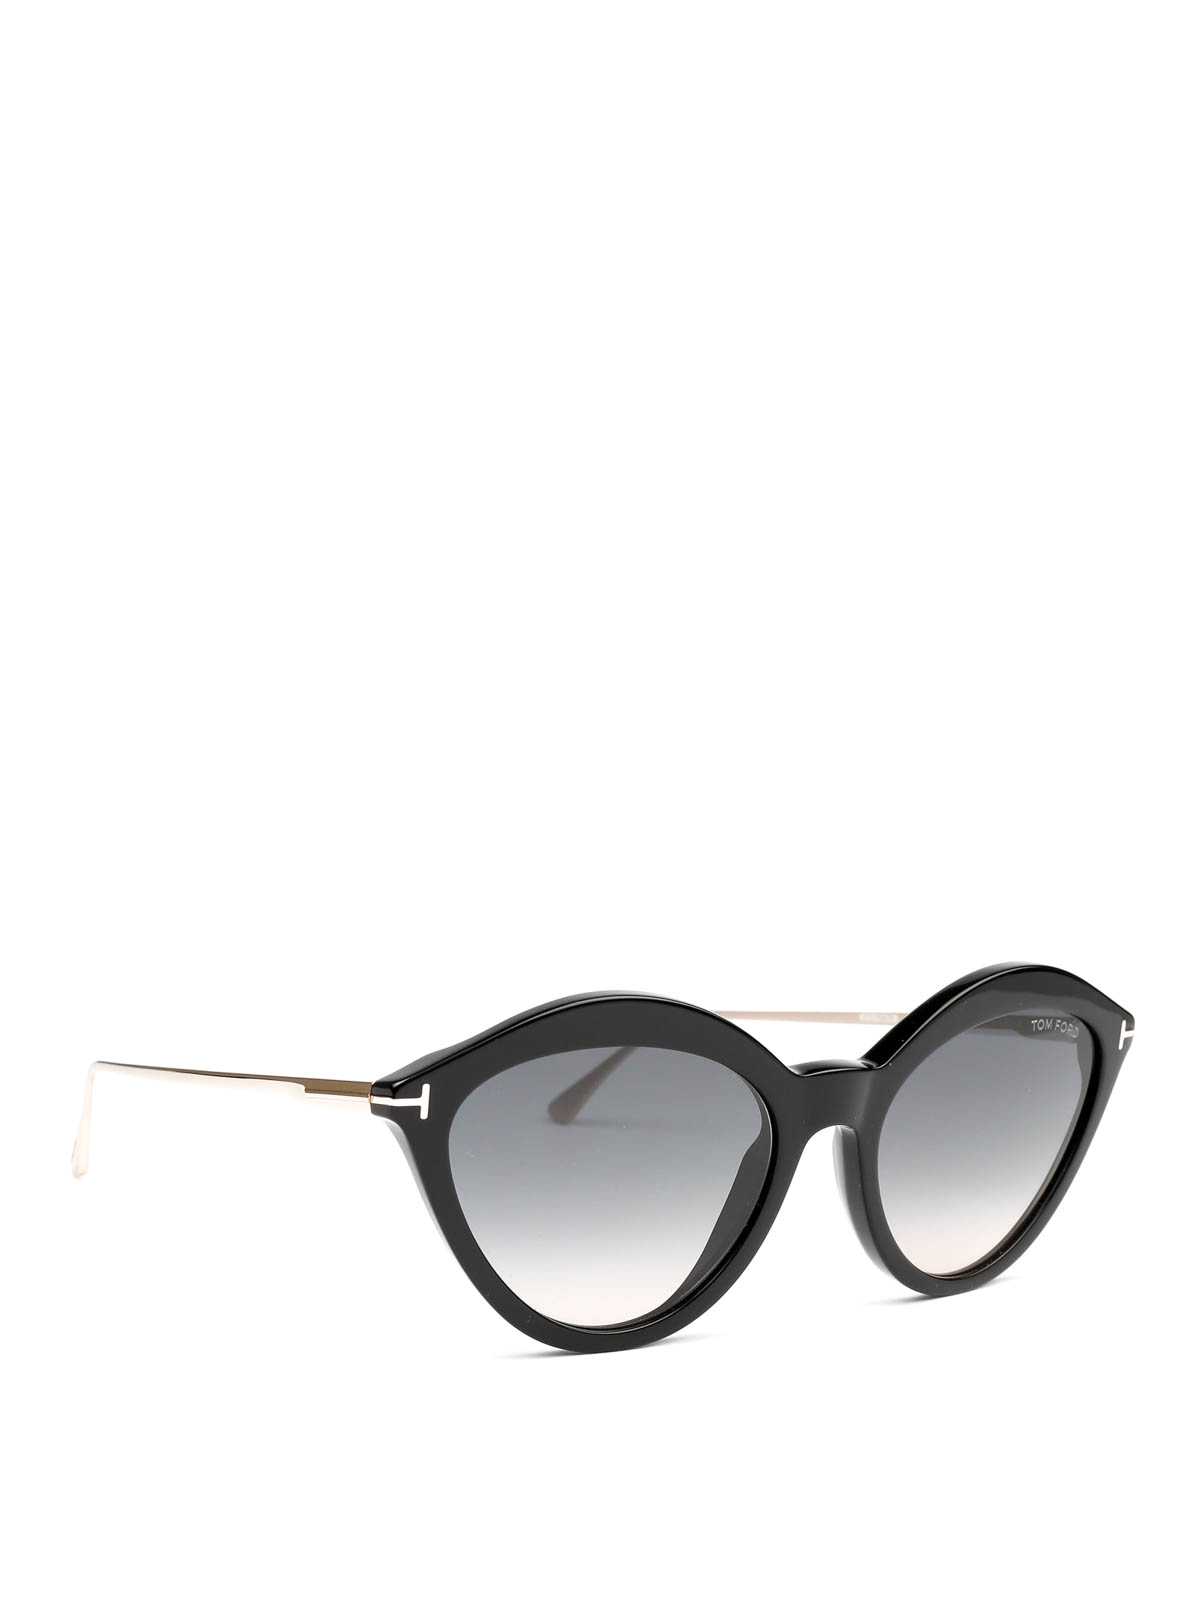 0fe273d021980 Tom Ford - Chloe black sunglasses - عینک آفتابی - FT0663 01B